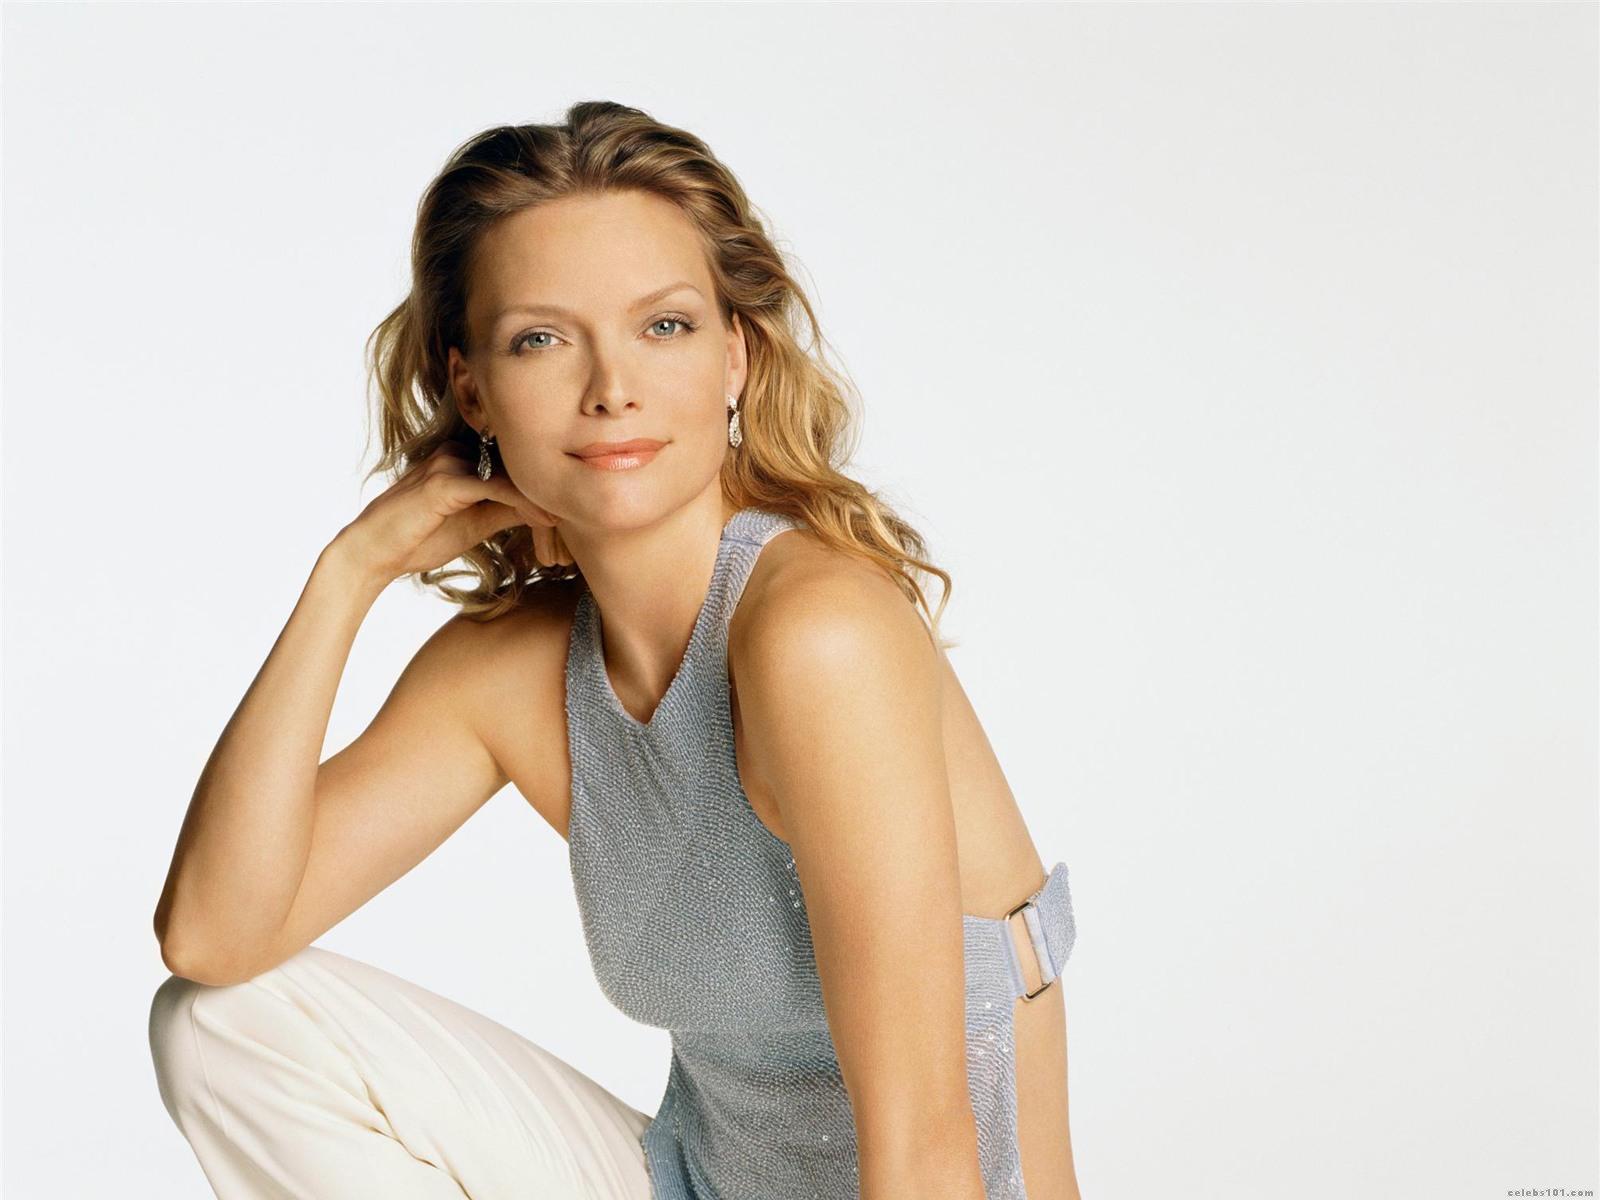 Michelle Pfeiffer - HD Wallpapers